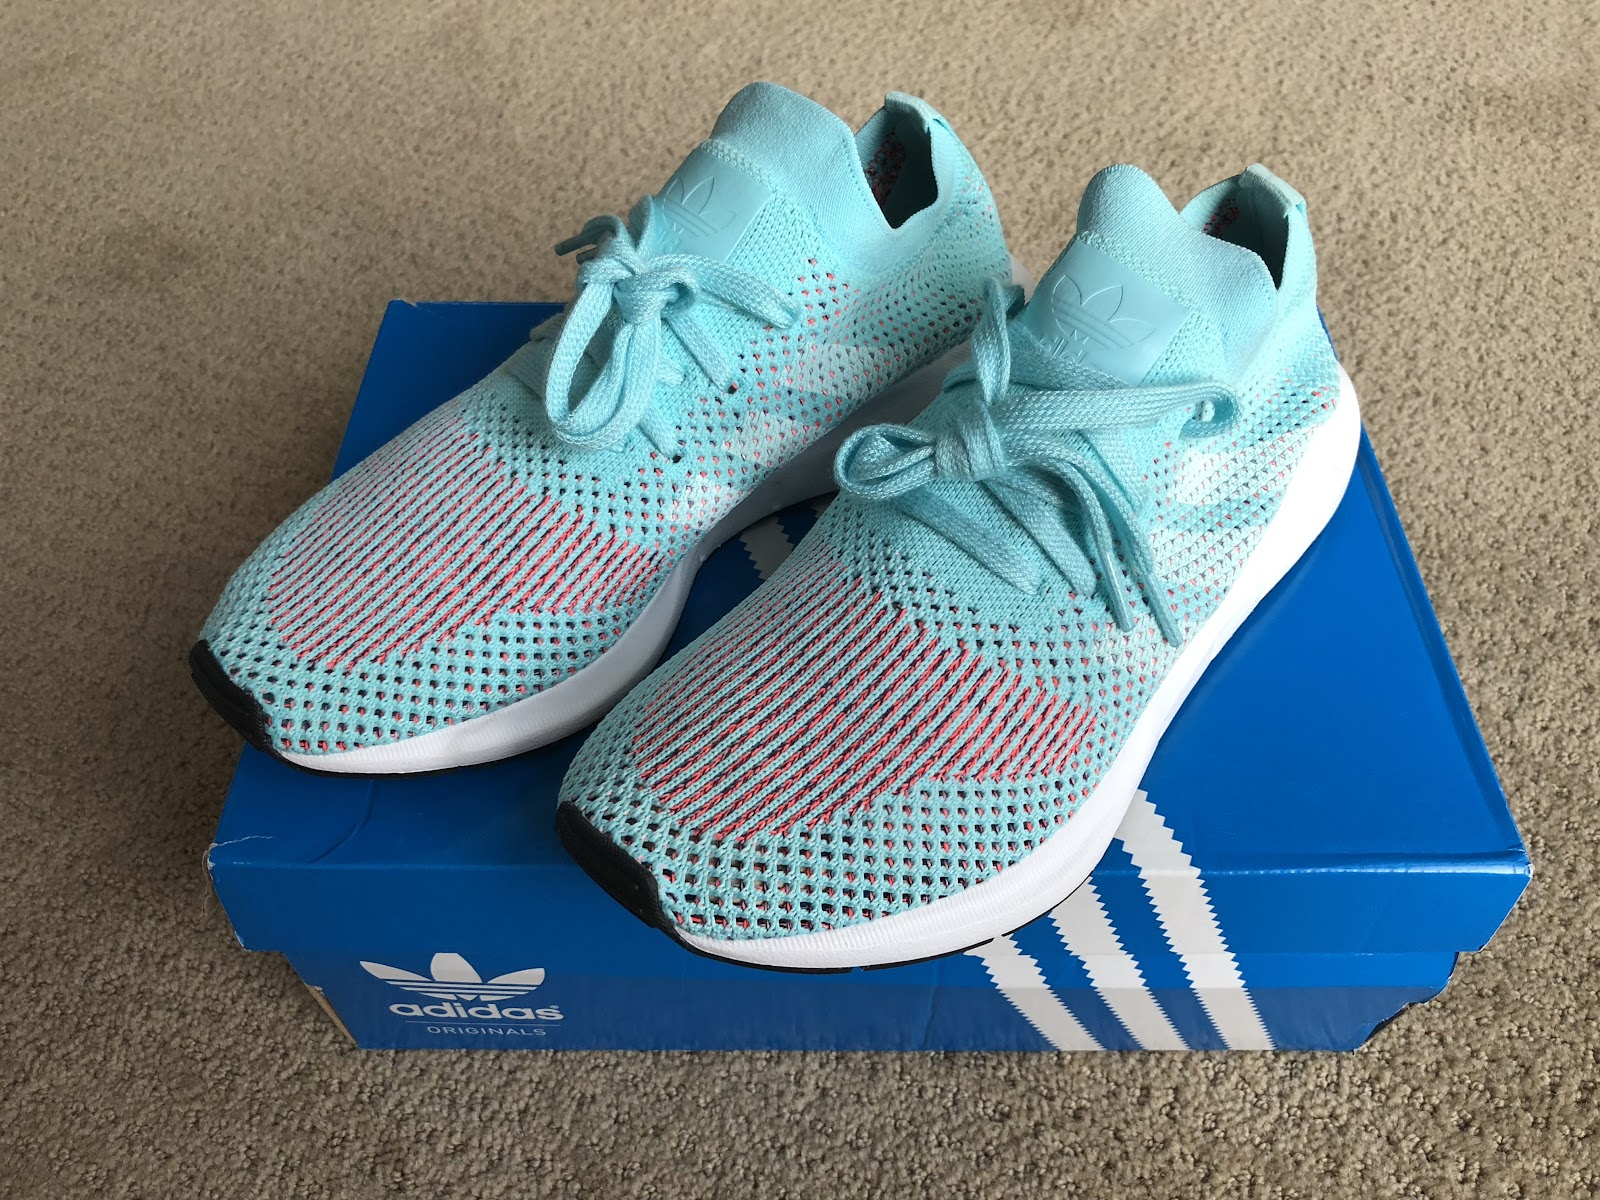 697669ca0a0 Details about CQ2034 Adidas Originals Swift Run Pk Primeknit W Women Aqua  White Running Shoes